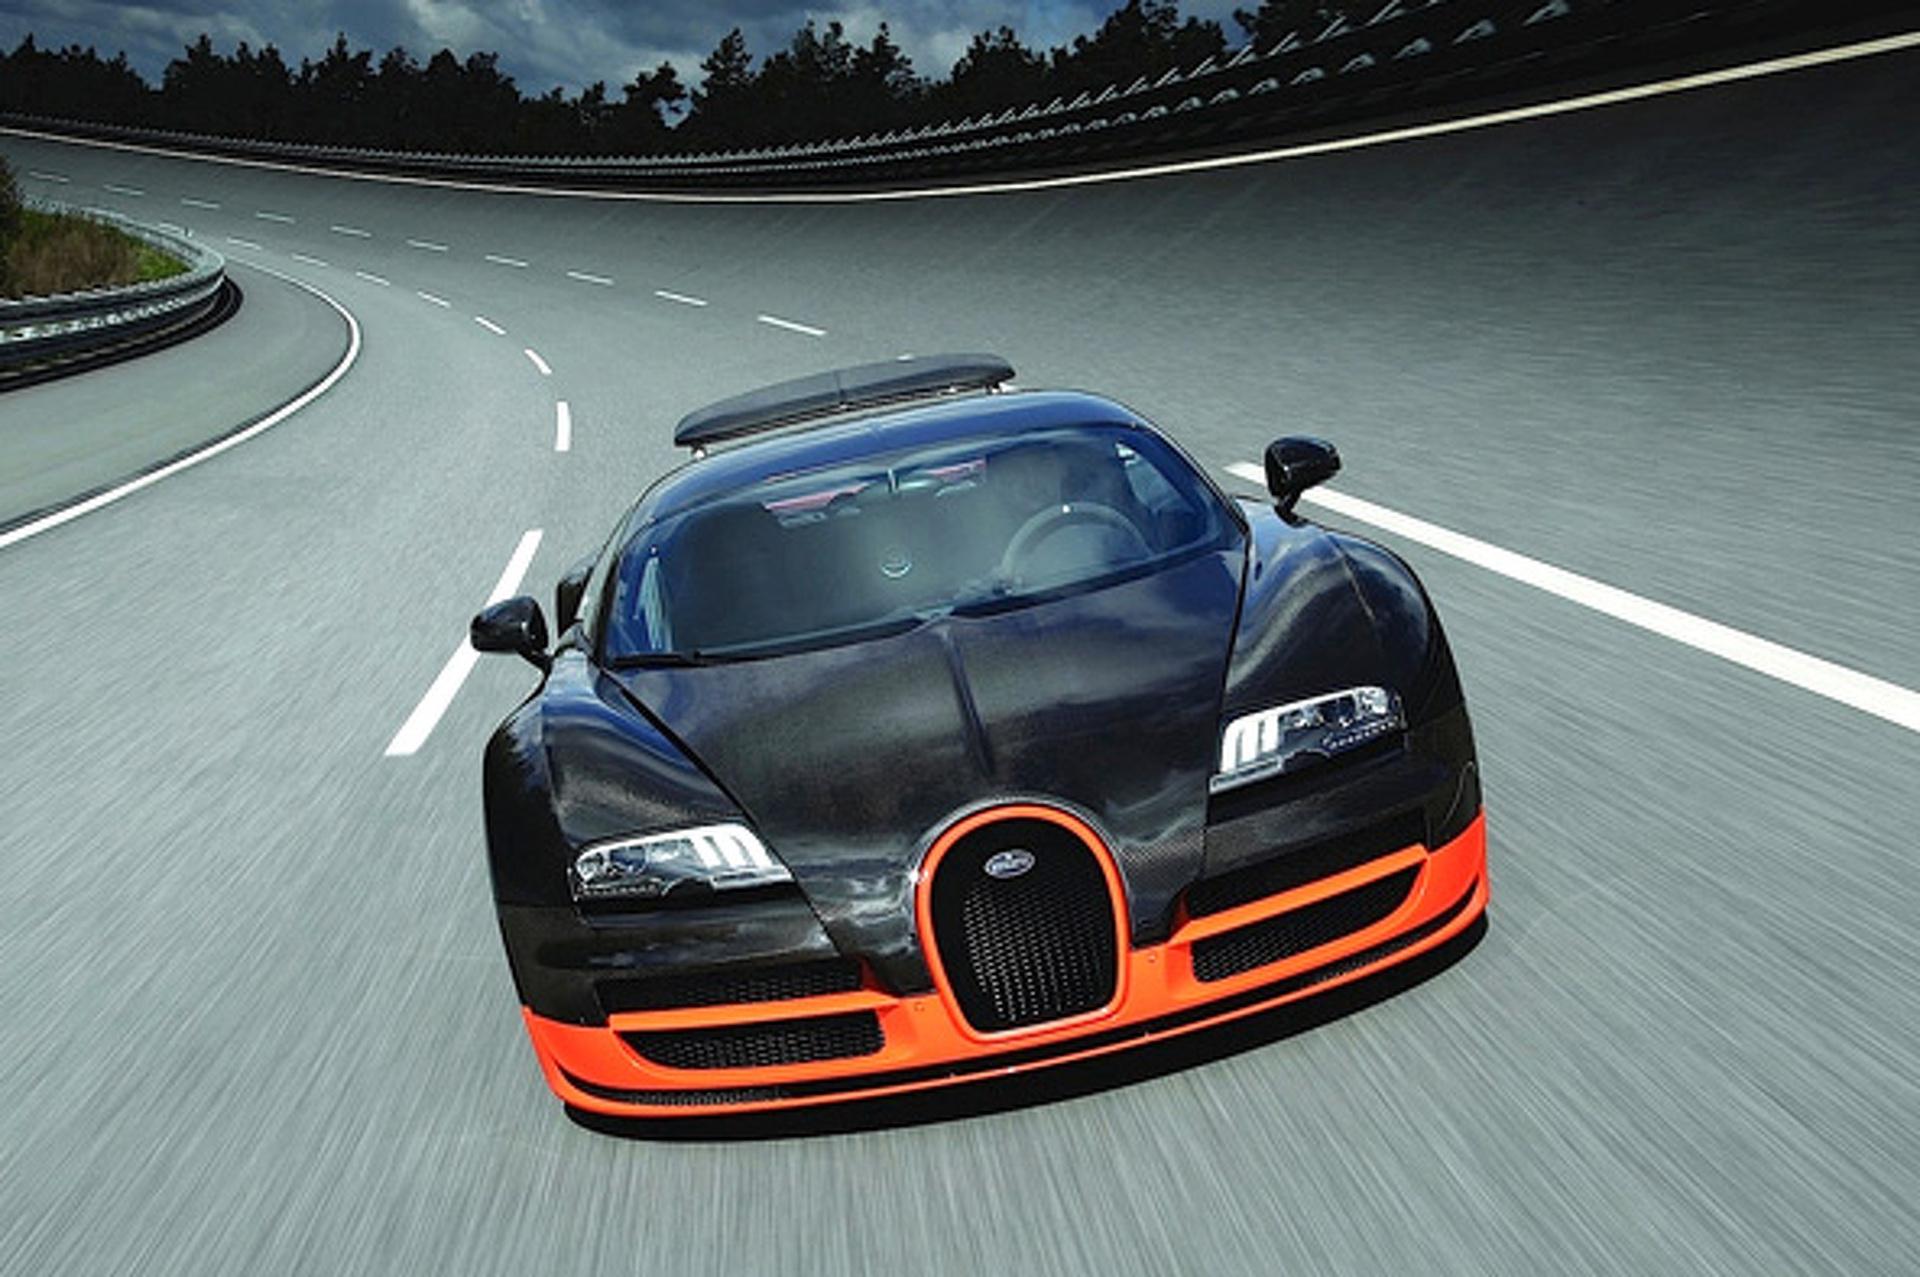 Wheels Wallpaper Bugatti Veyron 164 Super Sport